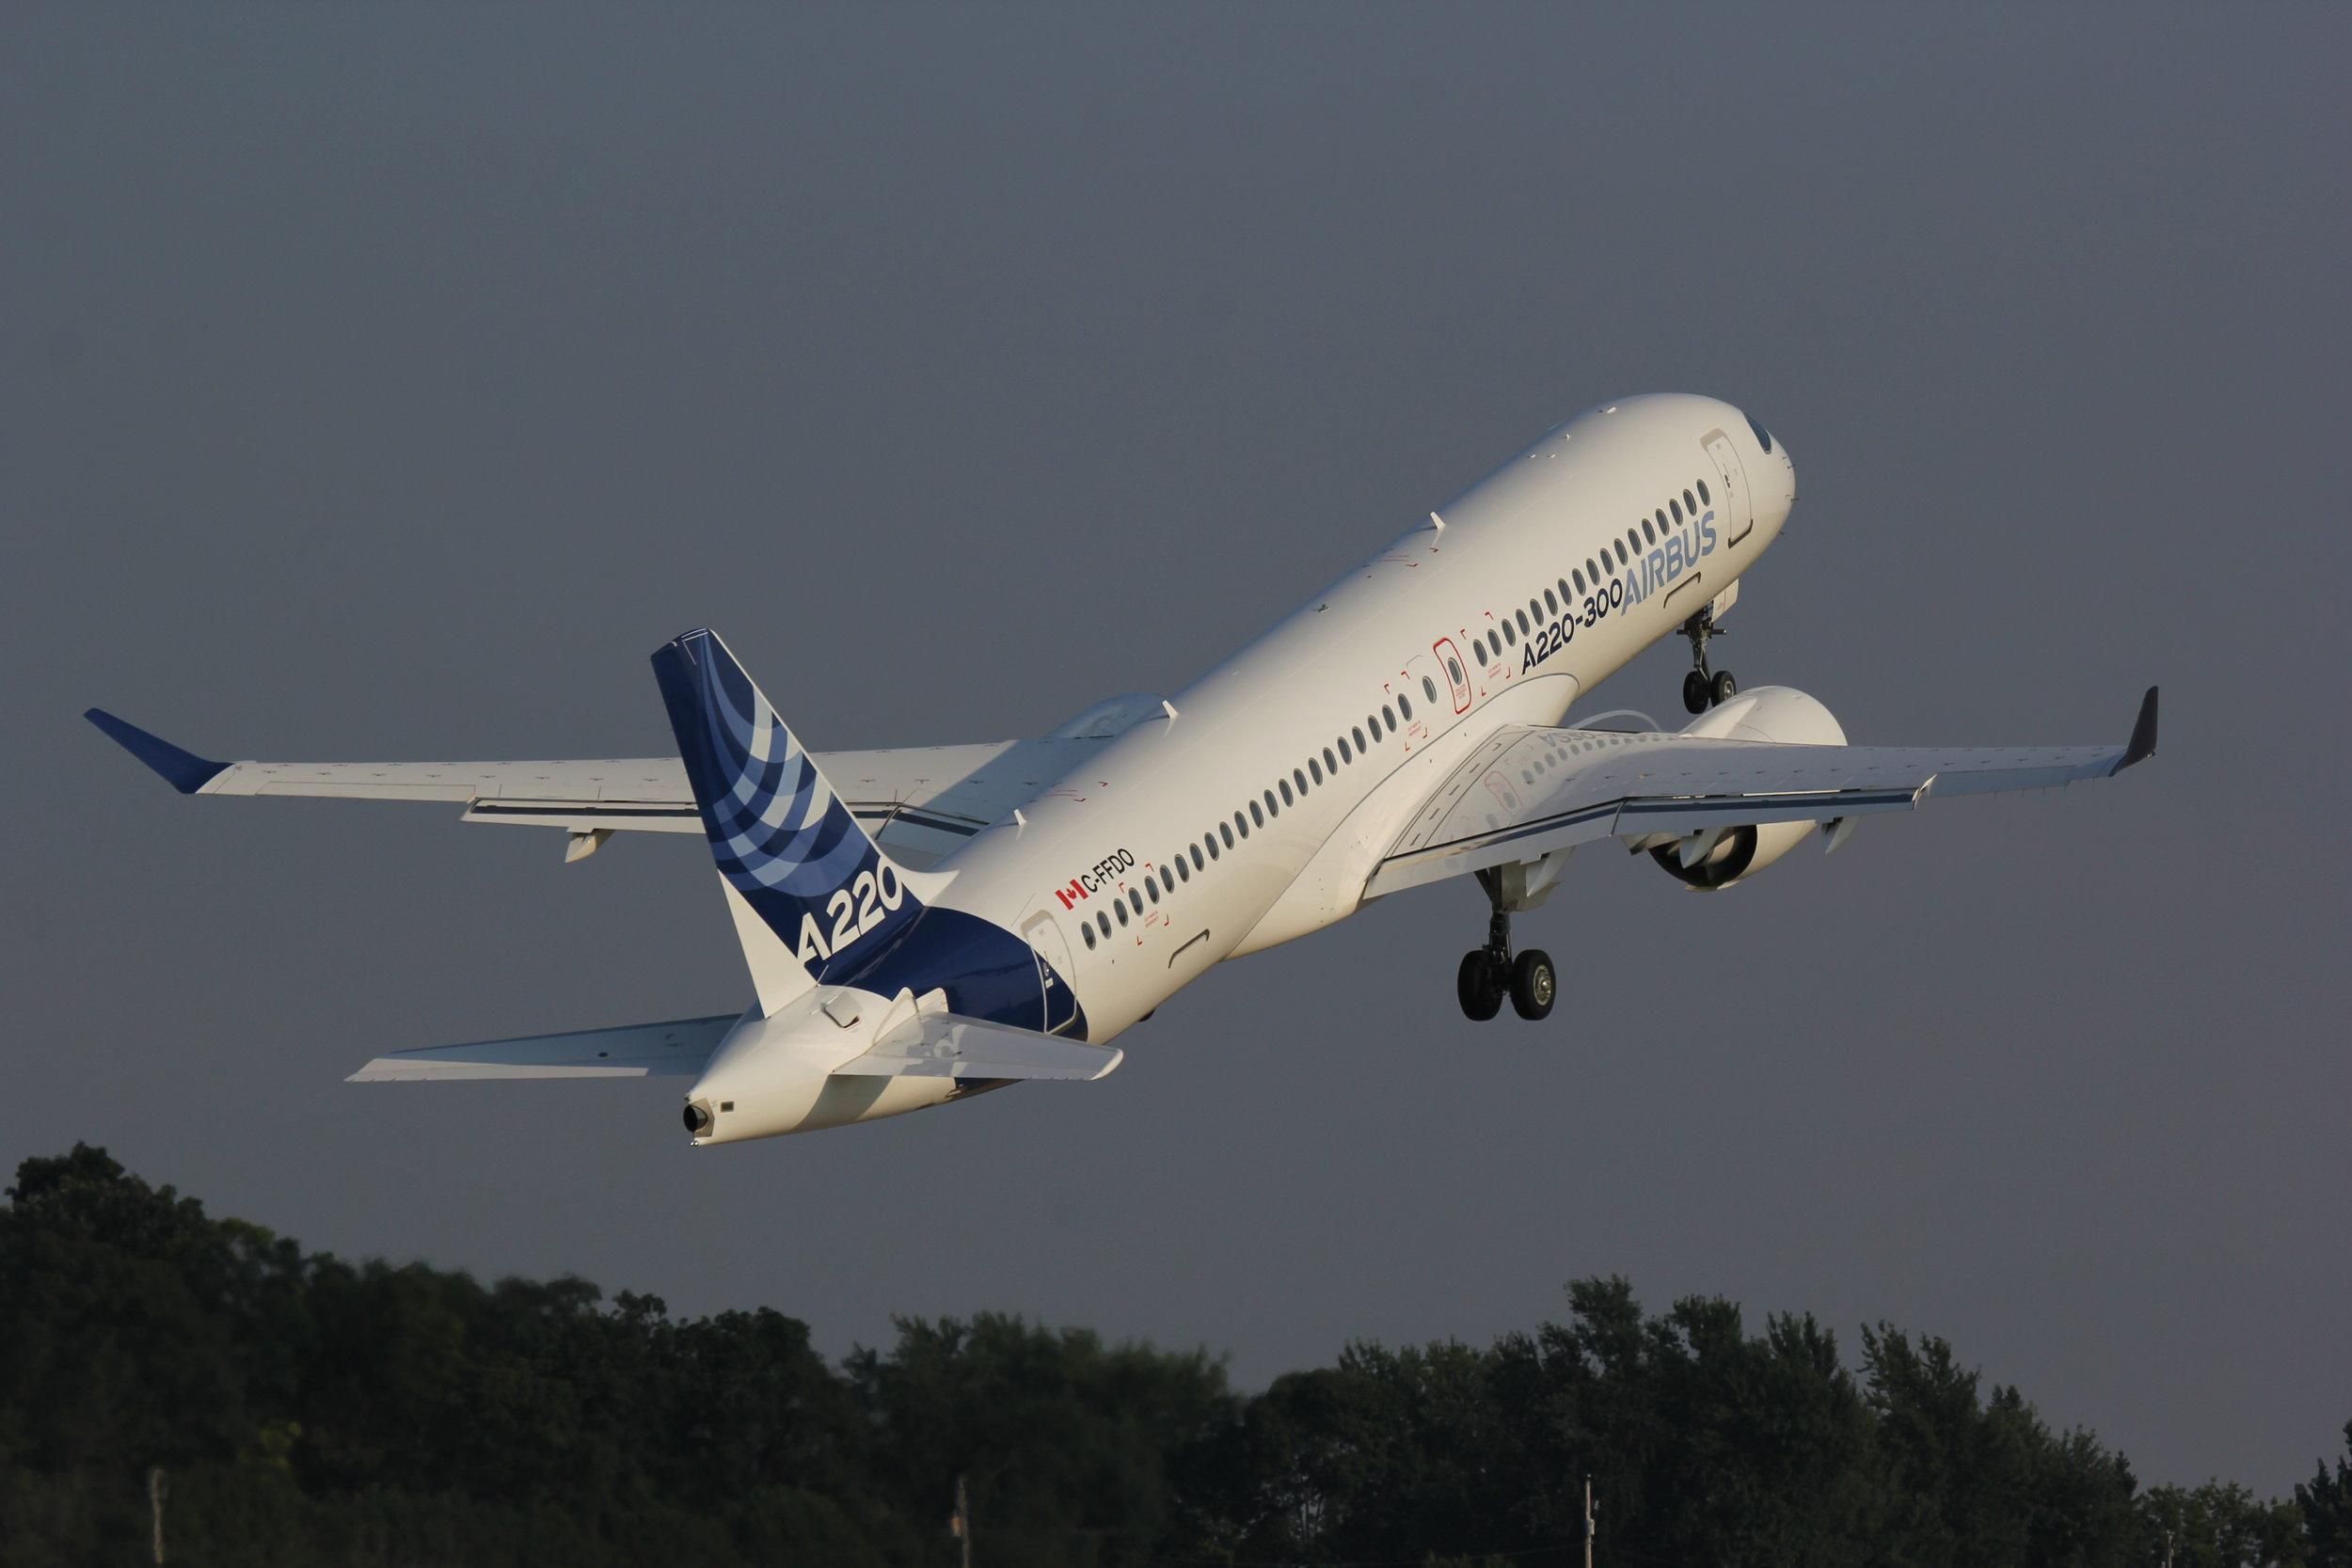 C-FFDO Airbus A220-300 departing Oshkosh 24th July 2018 taken by Alec Rankin